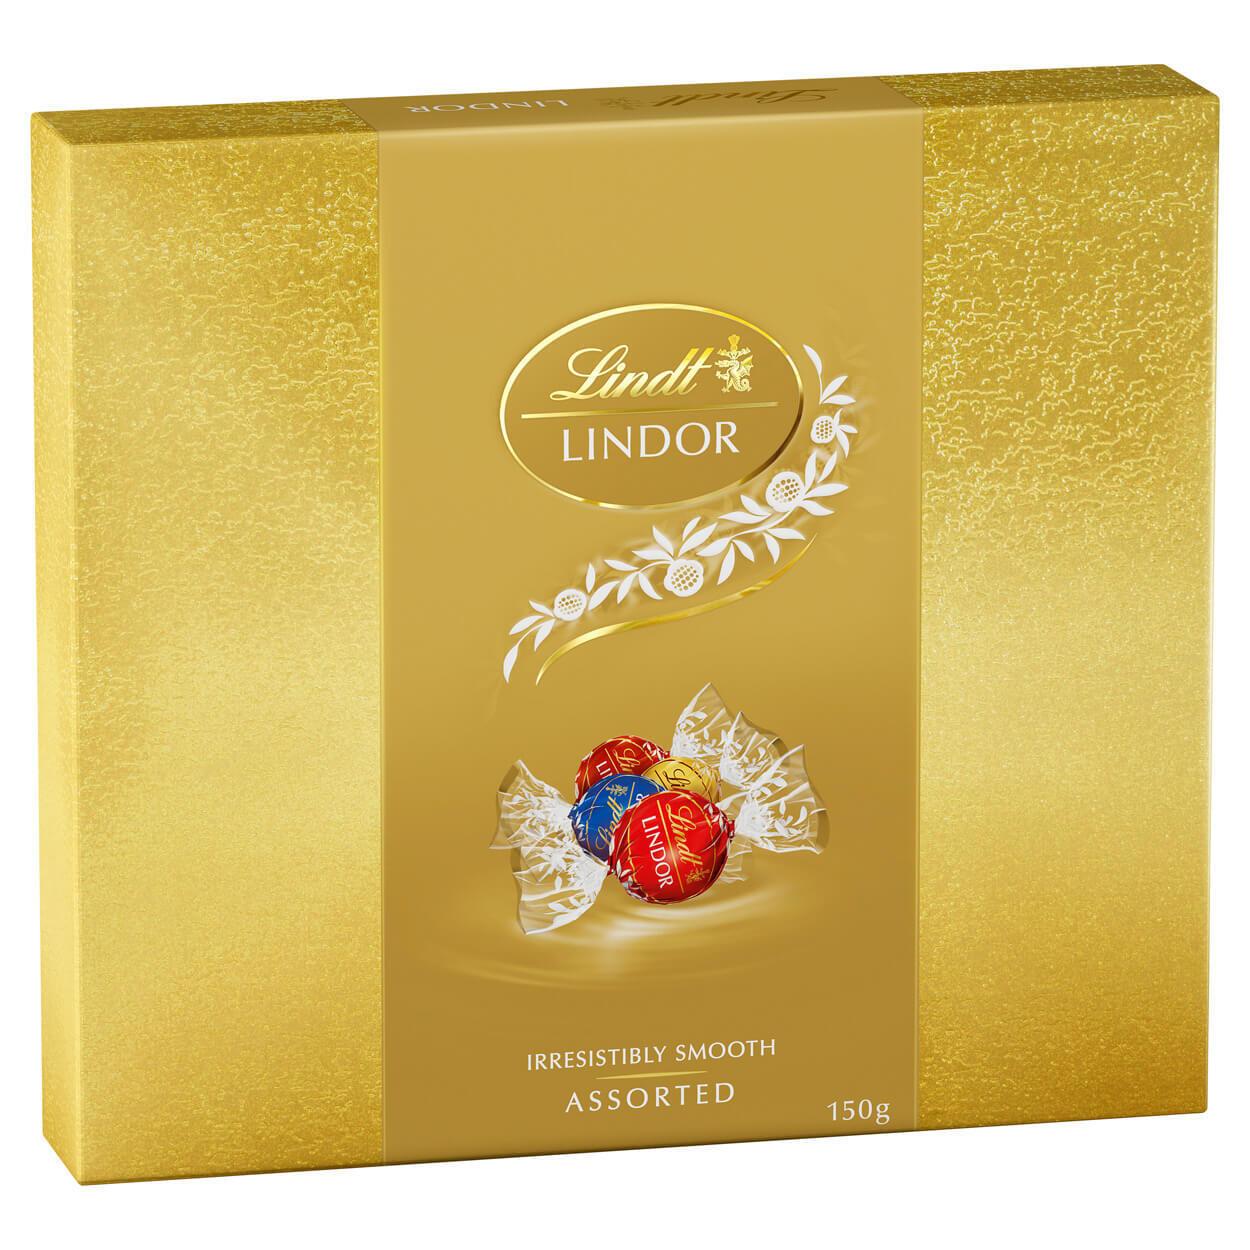 Lindt Lindor Chocolate Balls Assorted 150g Box